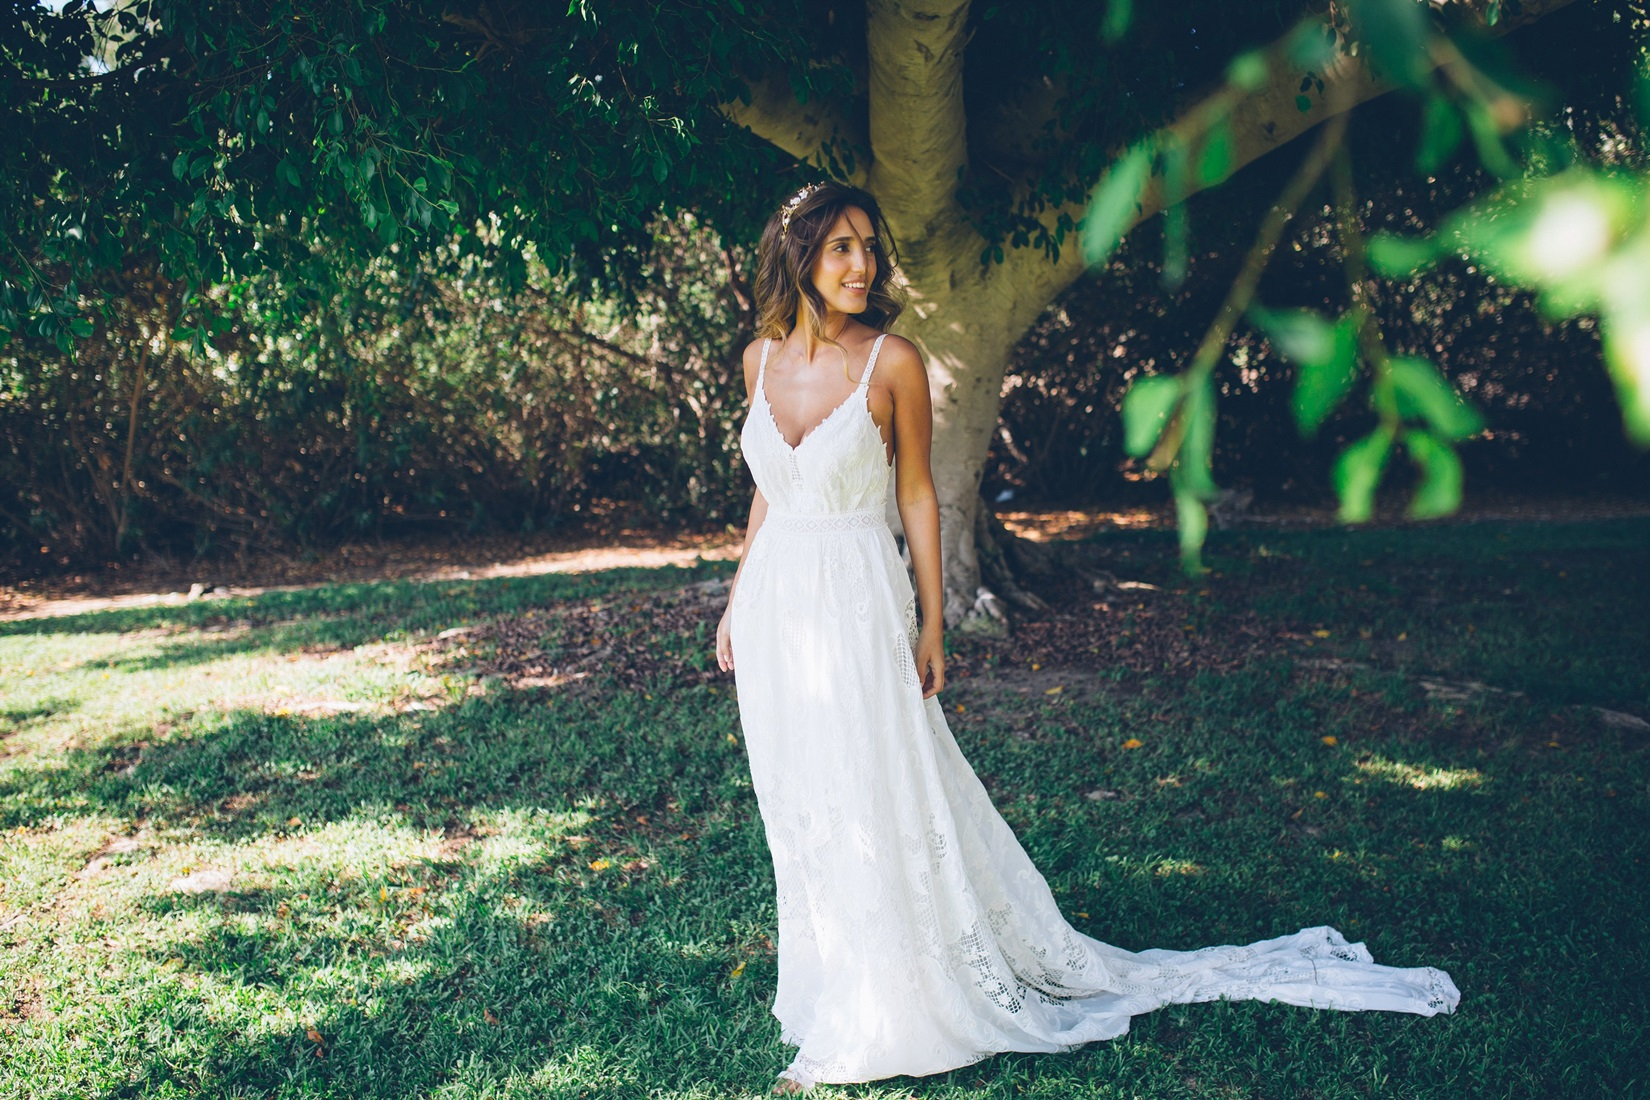 She's Got The Look: החתונה של שי וניר